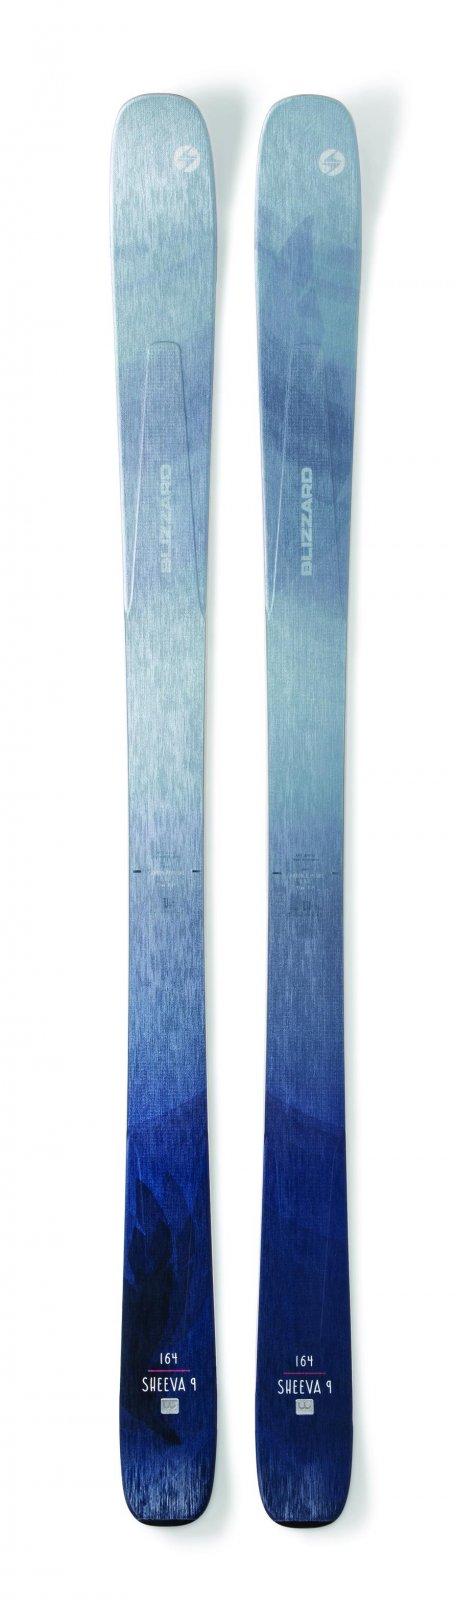 Blizzard Sheeva 9 Skis 2020